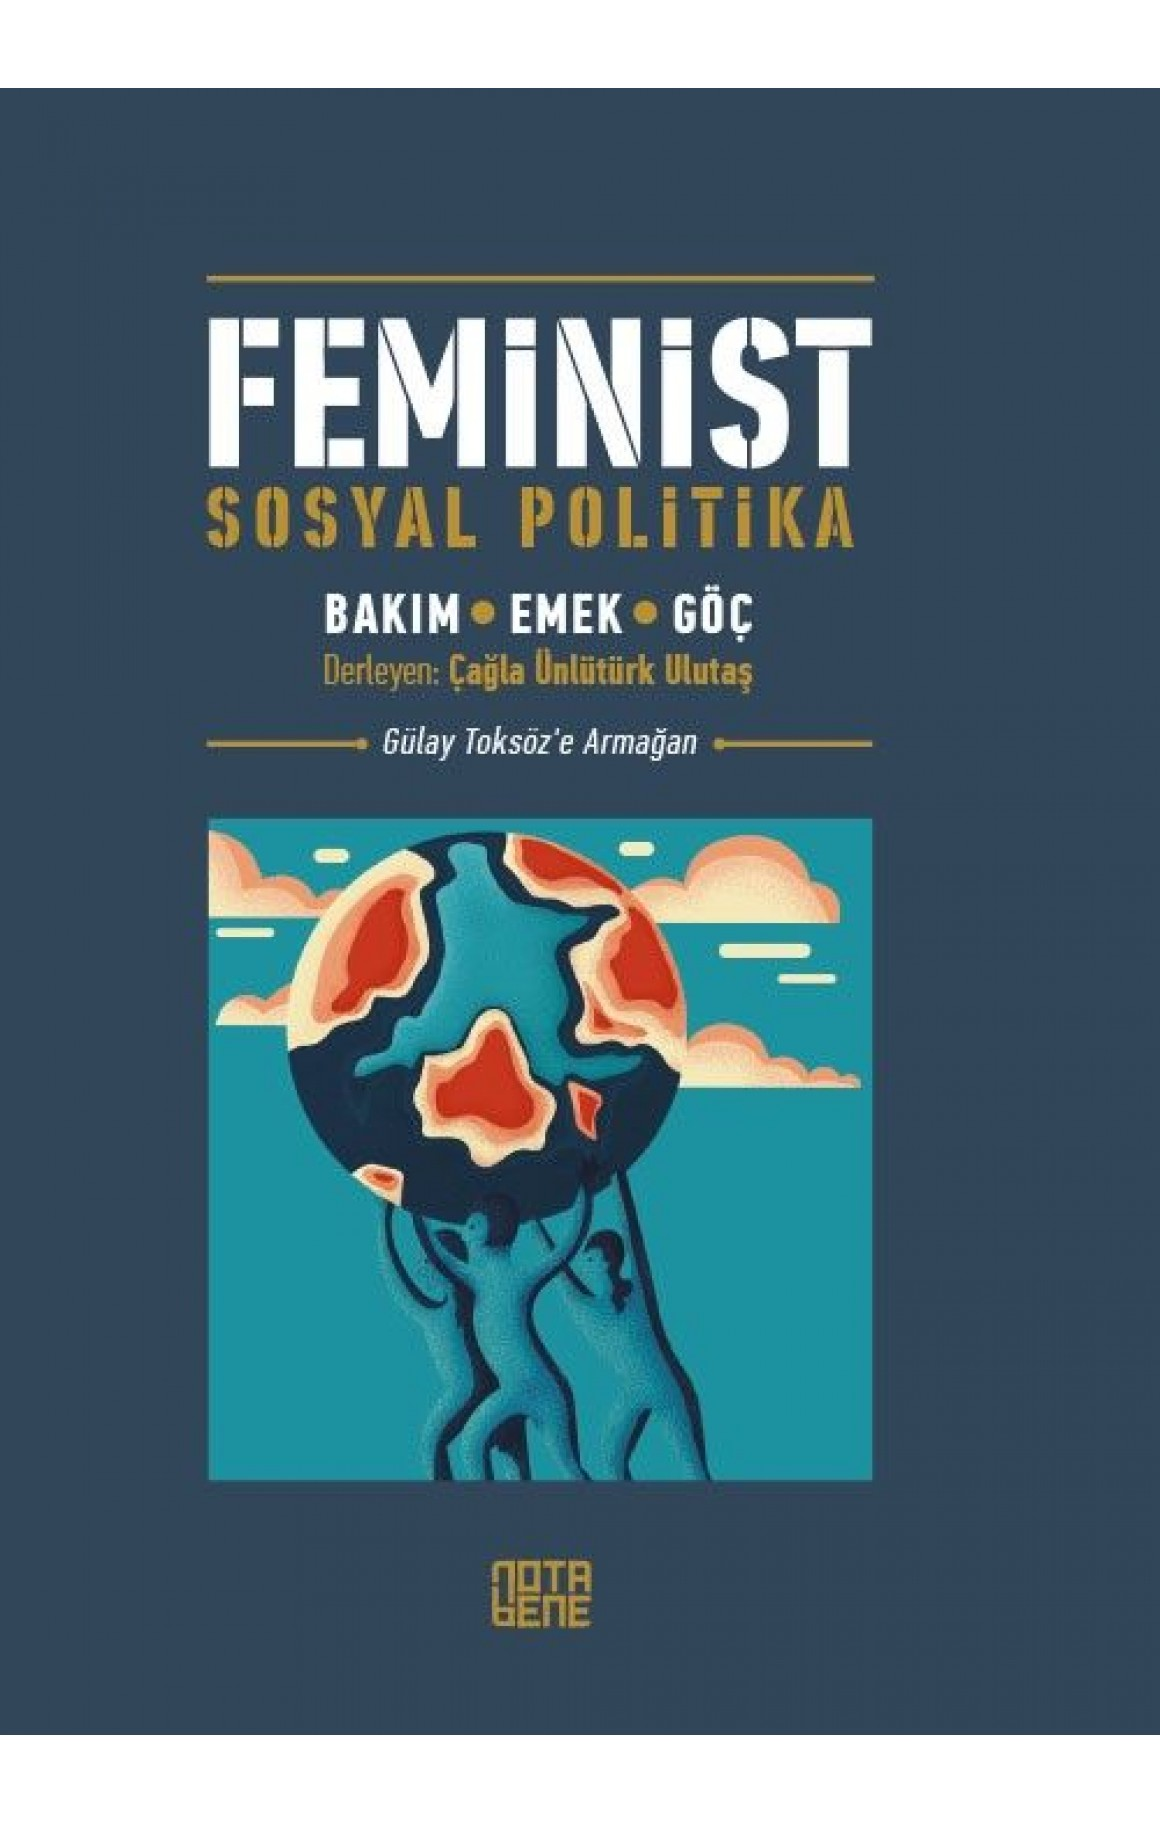 Feminist Sosyal Politika